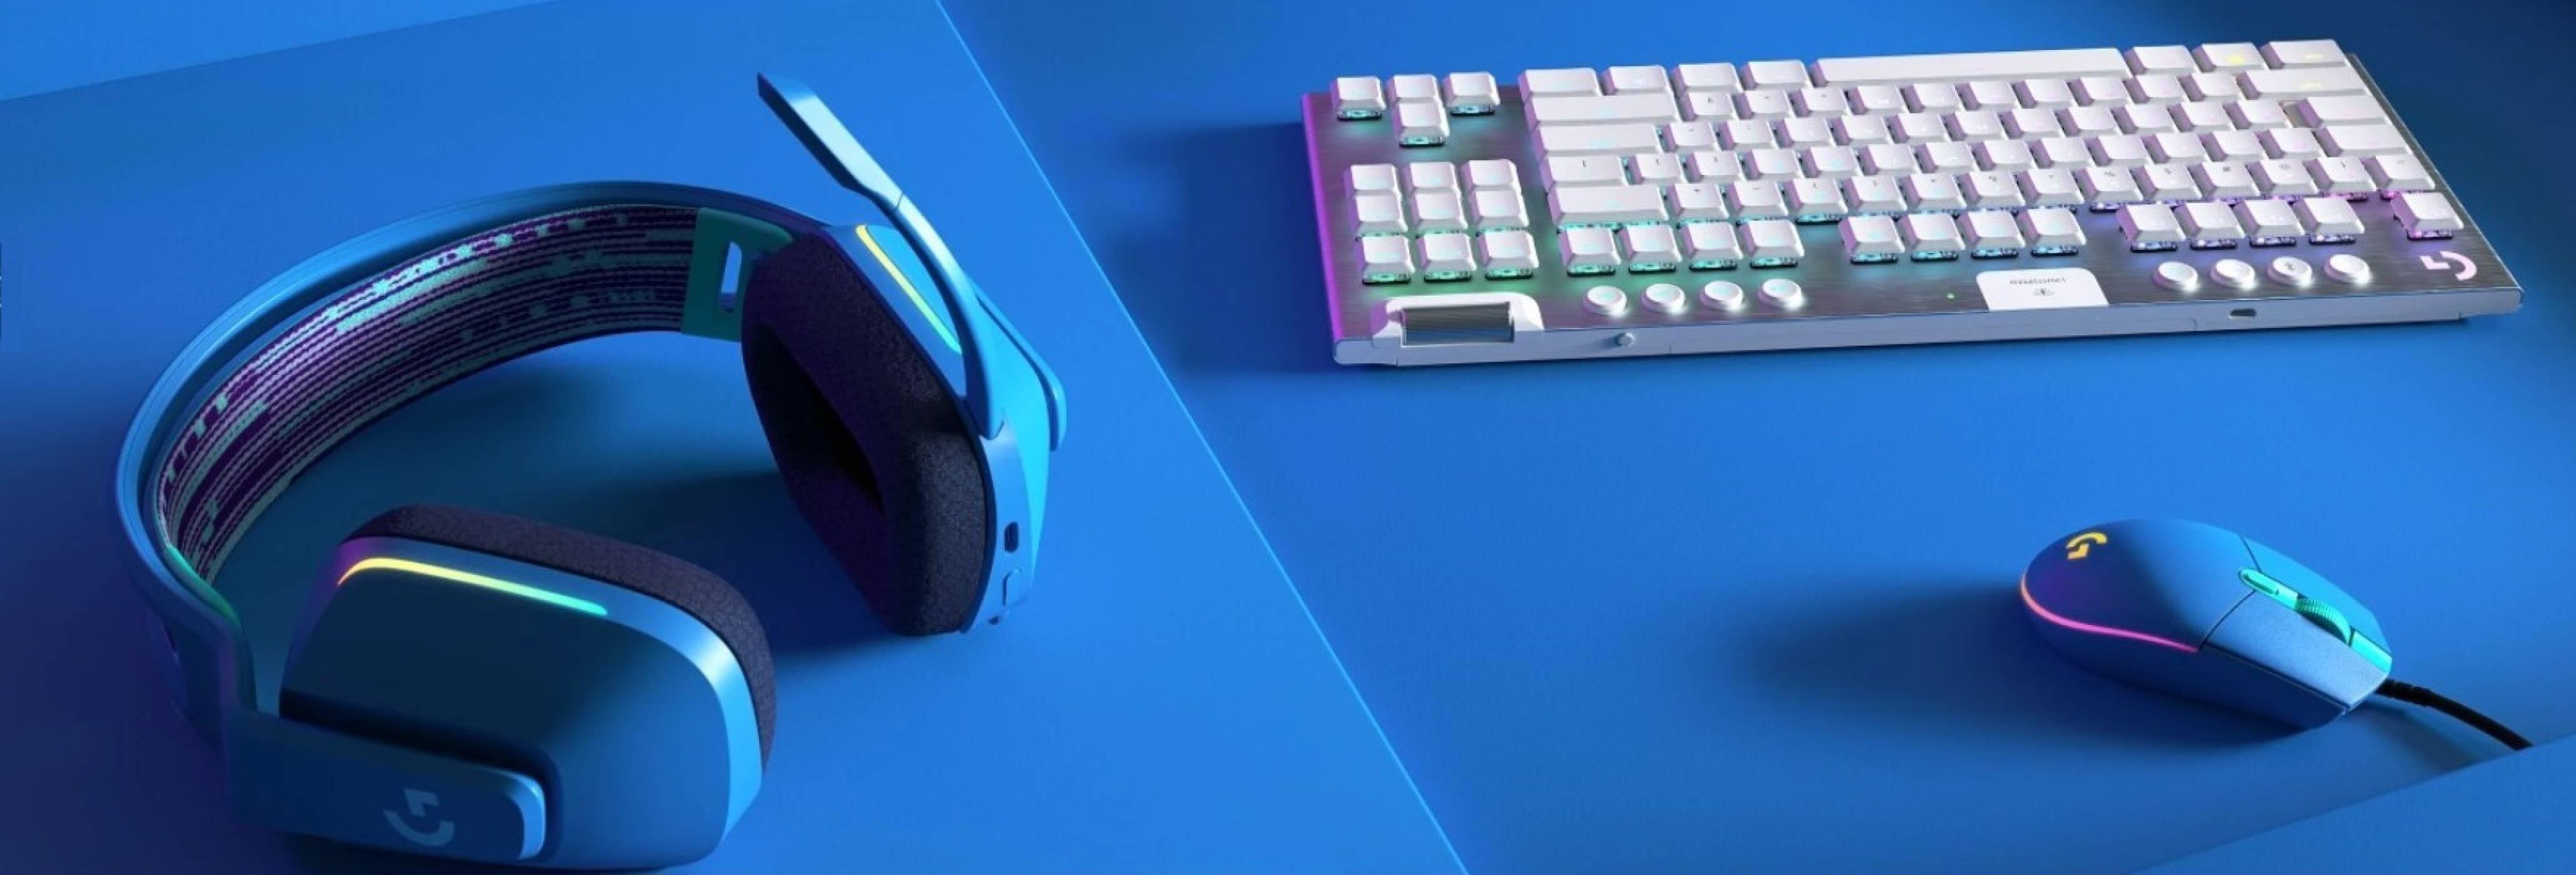 Logitech G-Series Color Collection – елитна геймърска периферия в свежи, ярки цветове (РЕВЮ)